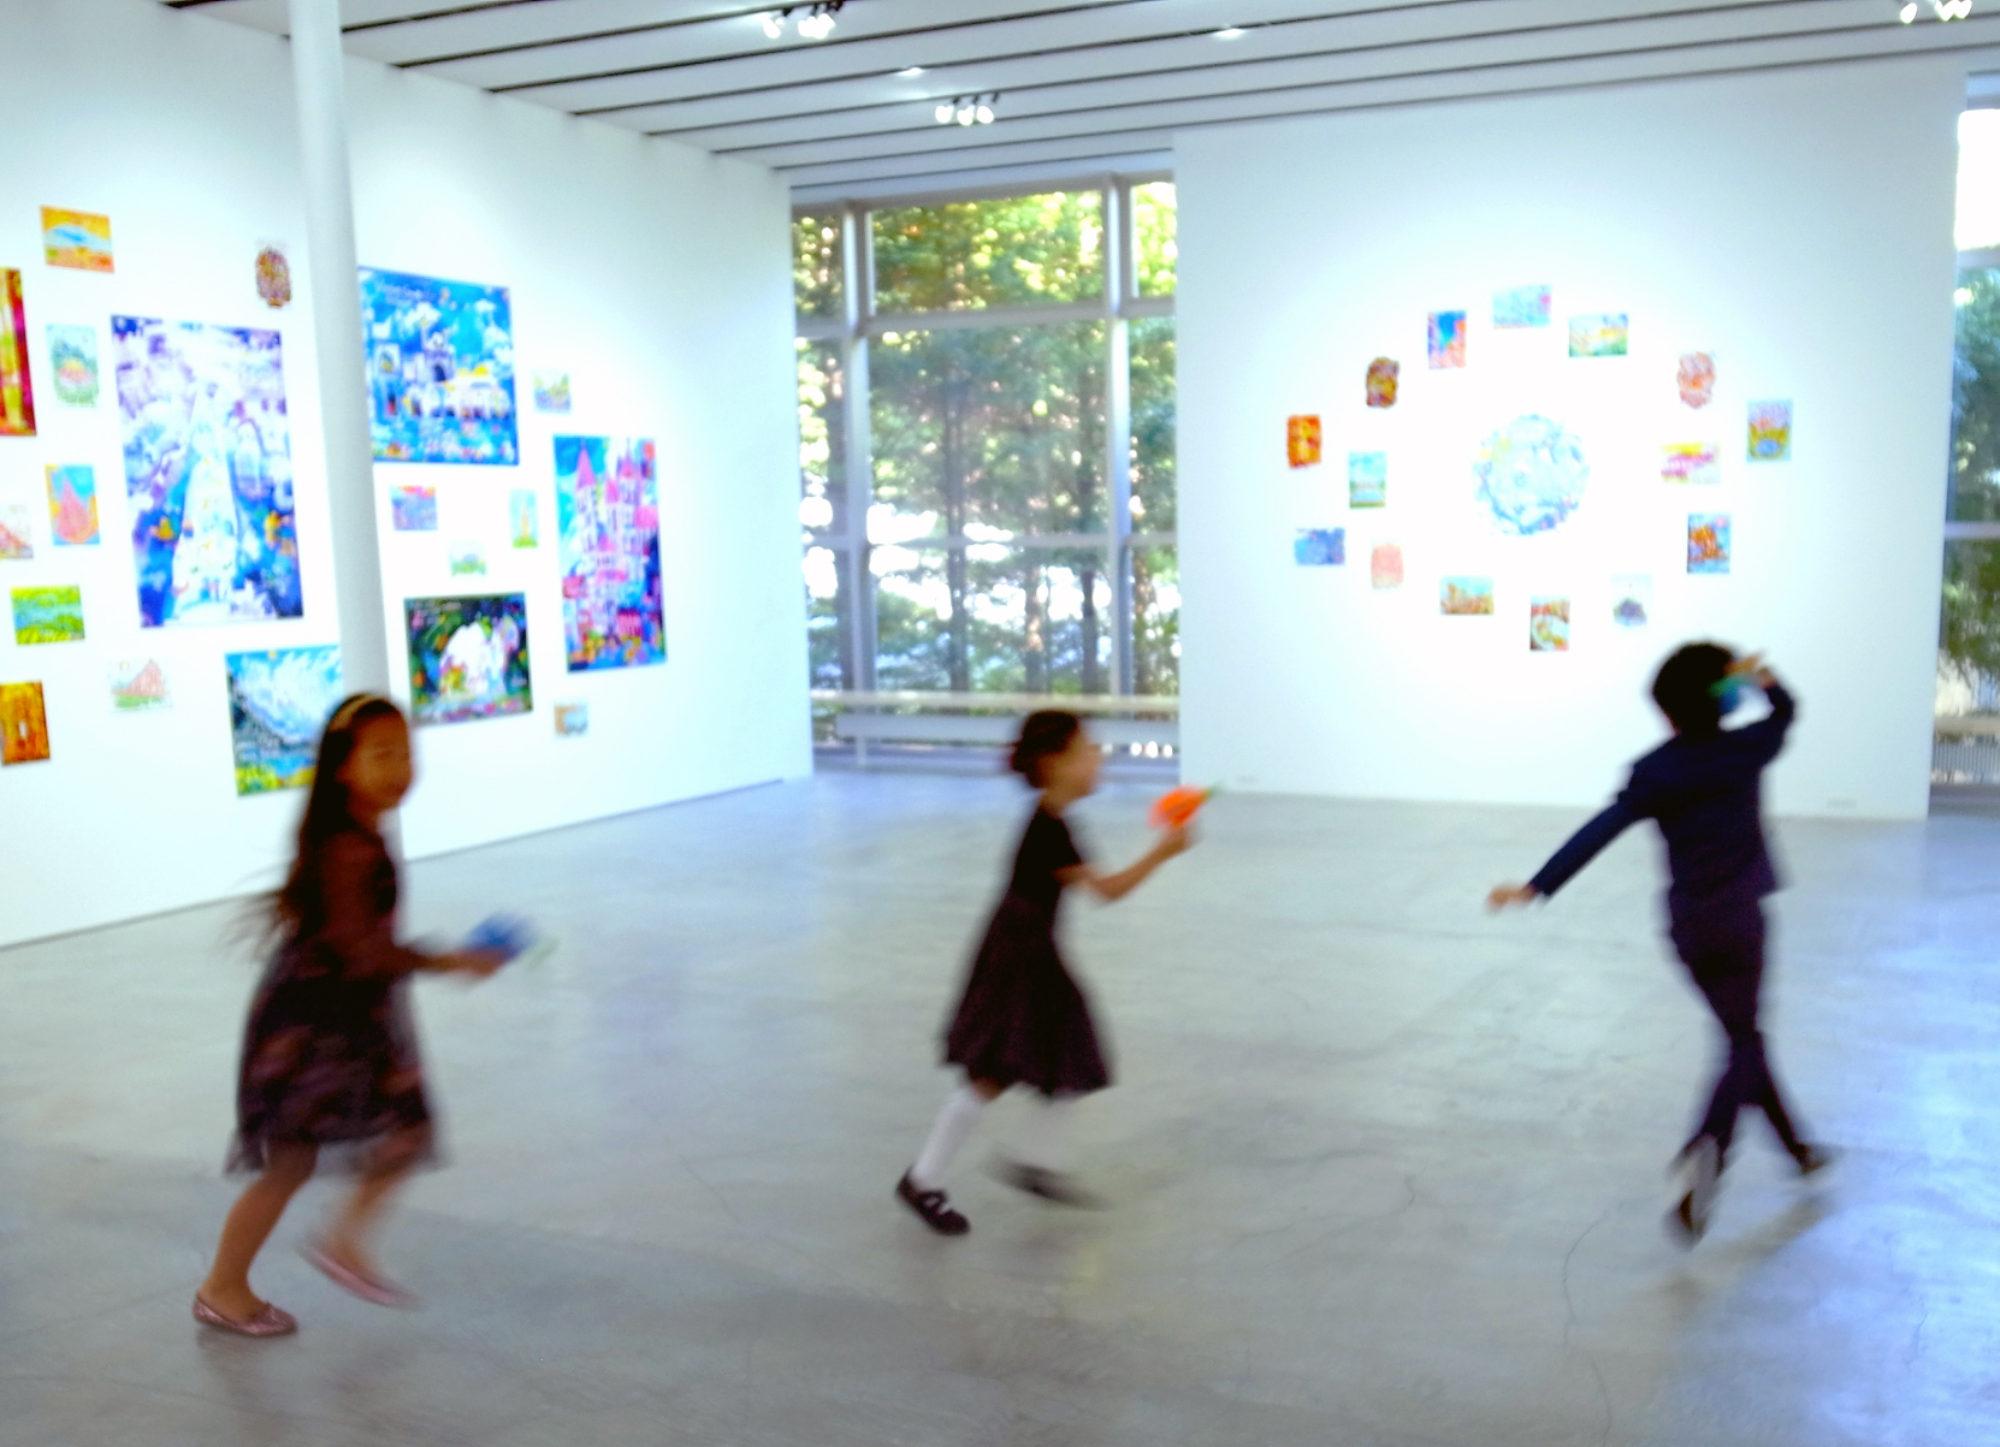 KOICHI MATSUDA | WORLD HERITAGE ART | 松田光一 | 世界遺産アート